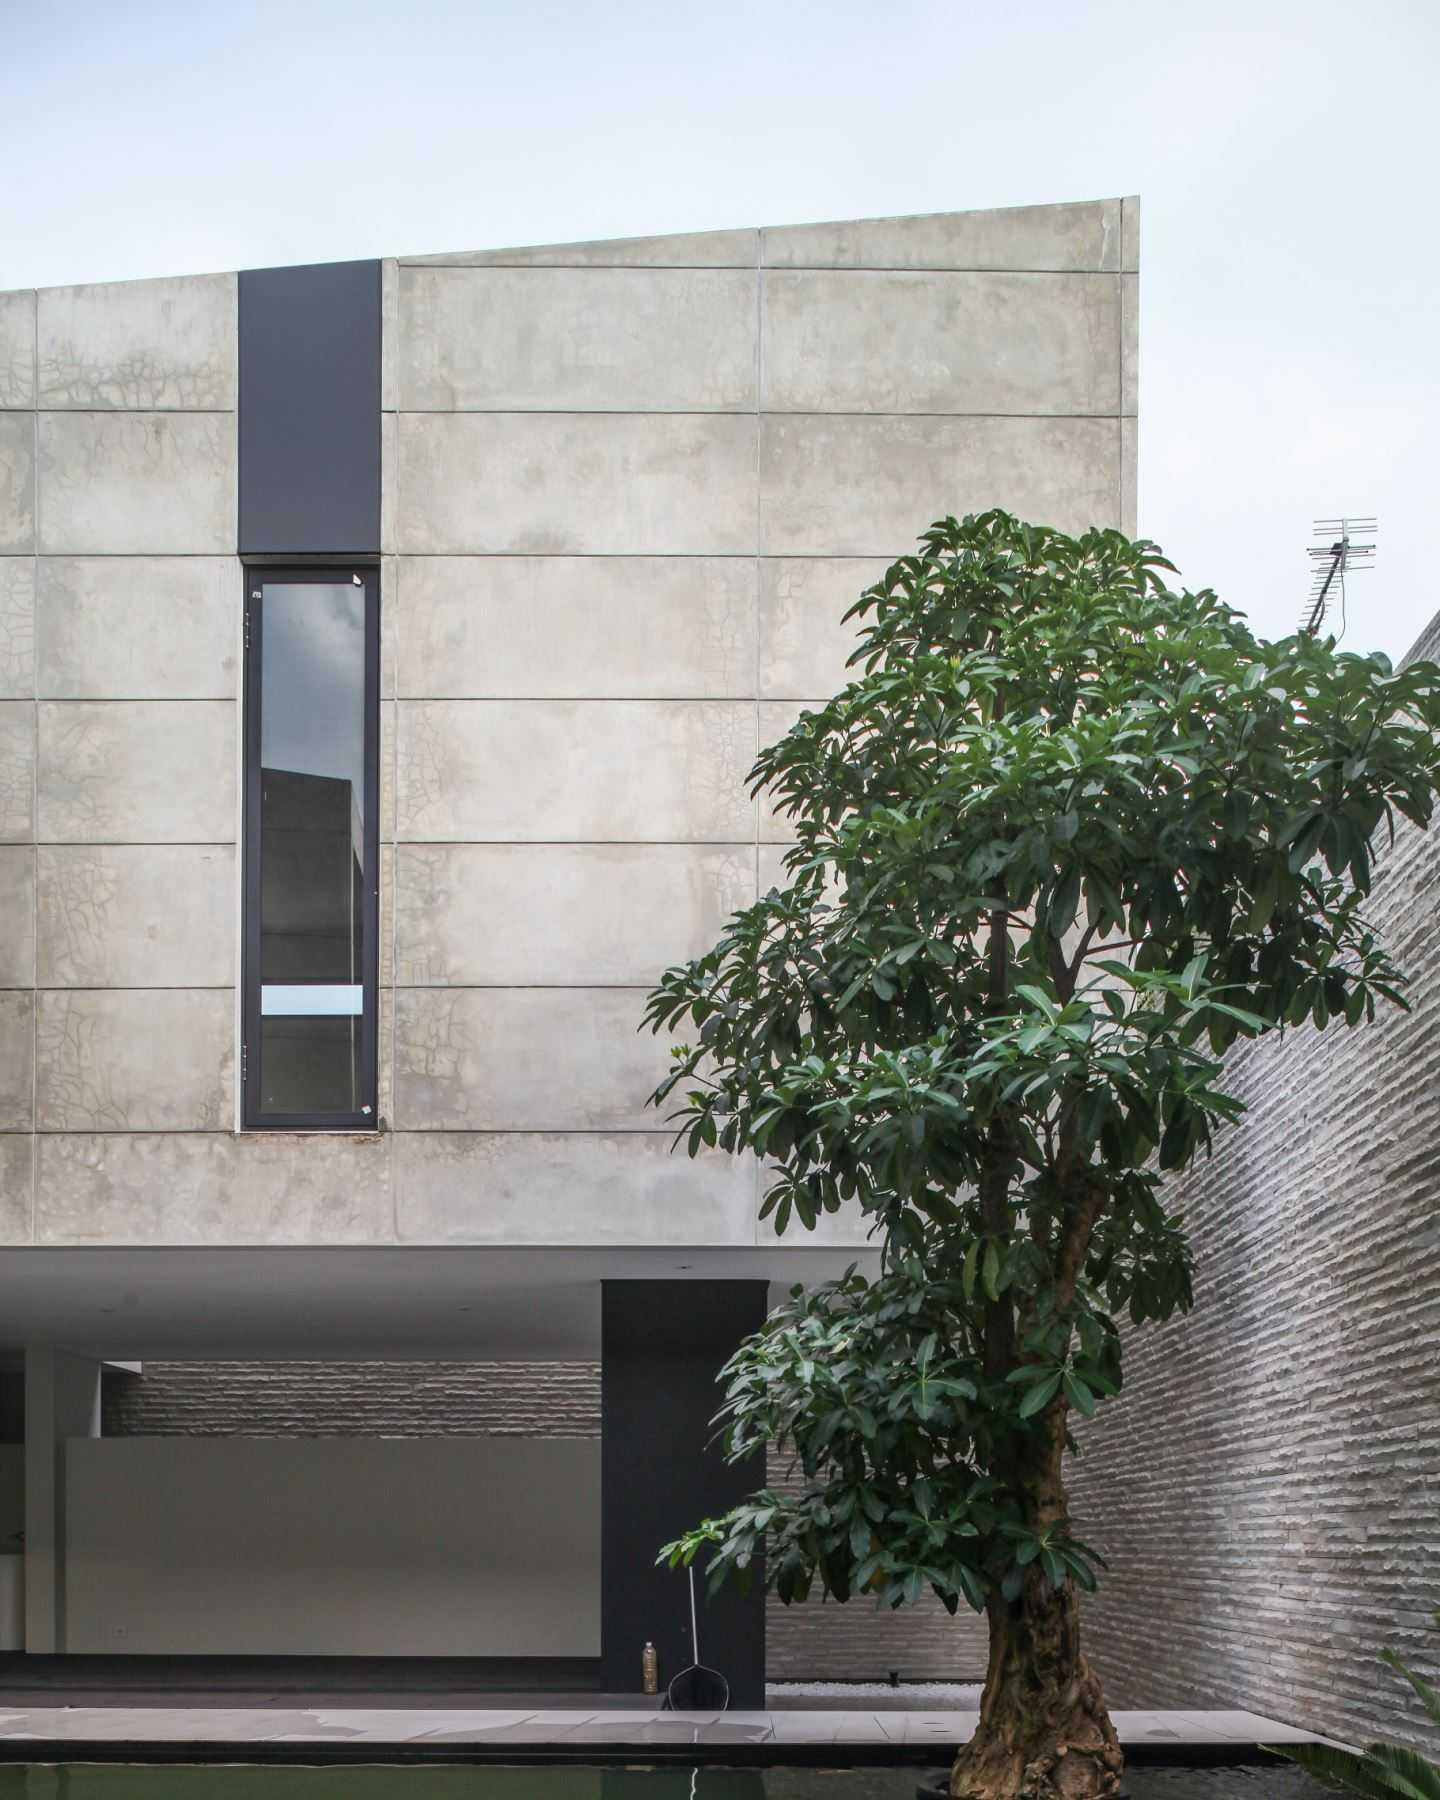 Ivan Priatman Architecture Rl House Surabaya, Kota Sby, Jawa Timur, Indonesia Surabaya, Kota Sby, Jawa Timur, Indonesia Ivan-Priatman-Architecture-Rl-House   59091